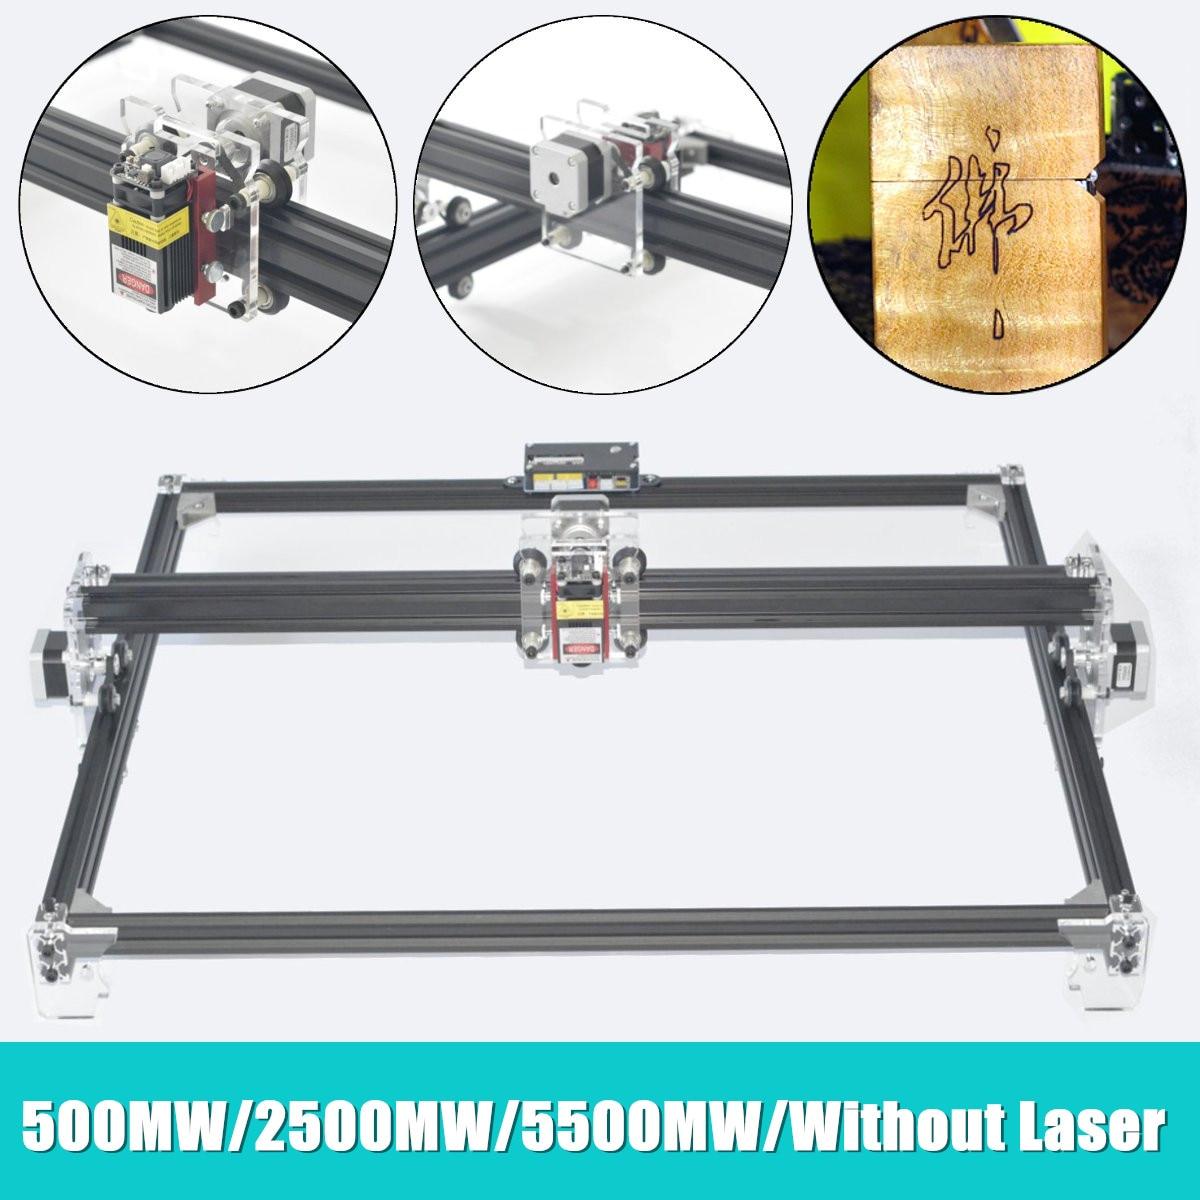 500mw/2500mw/5500mw Diy Laser Engraver Machine Dvp6550 Wood Router Cnc Miniusb Diy Engraver Desktop Wood Router/cutter/printer Quality First